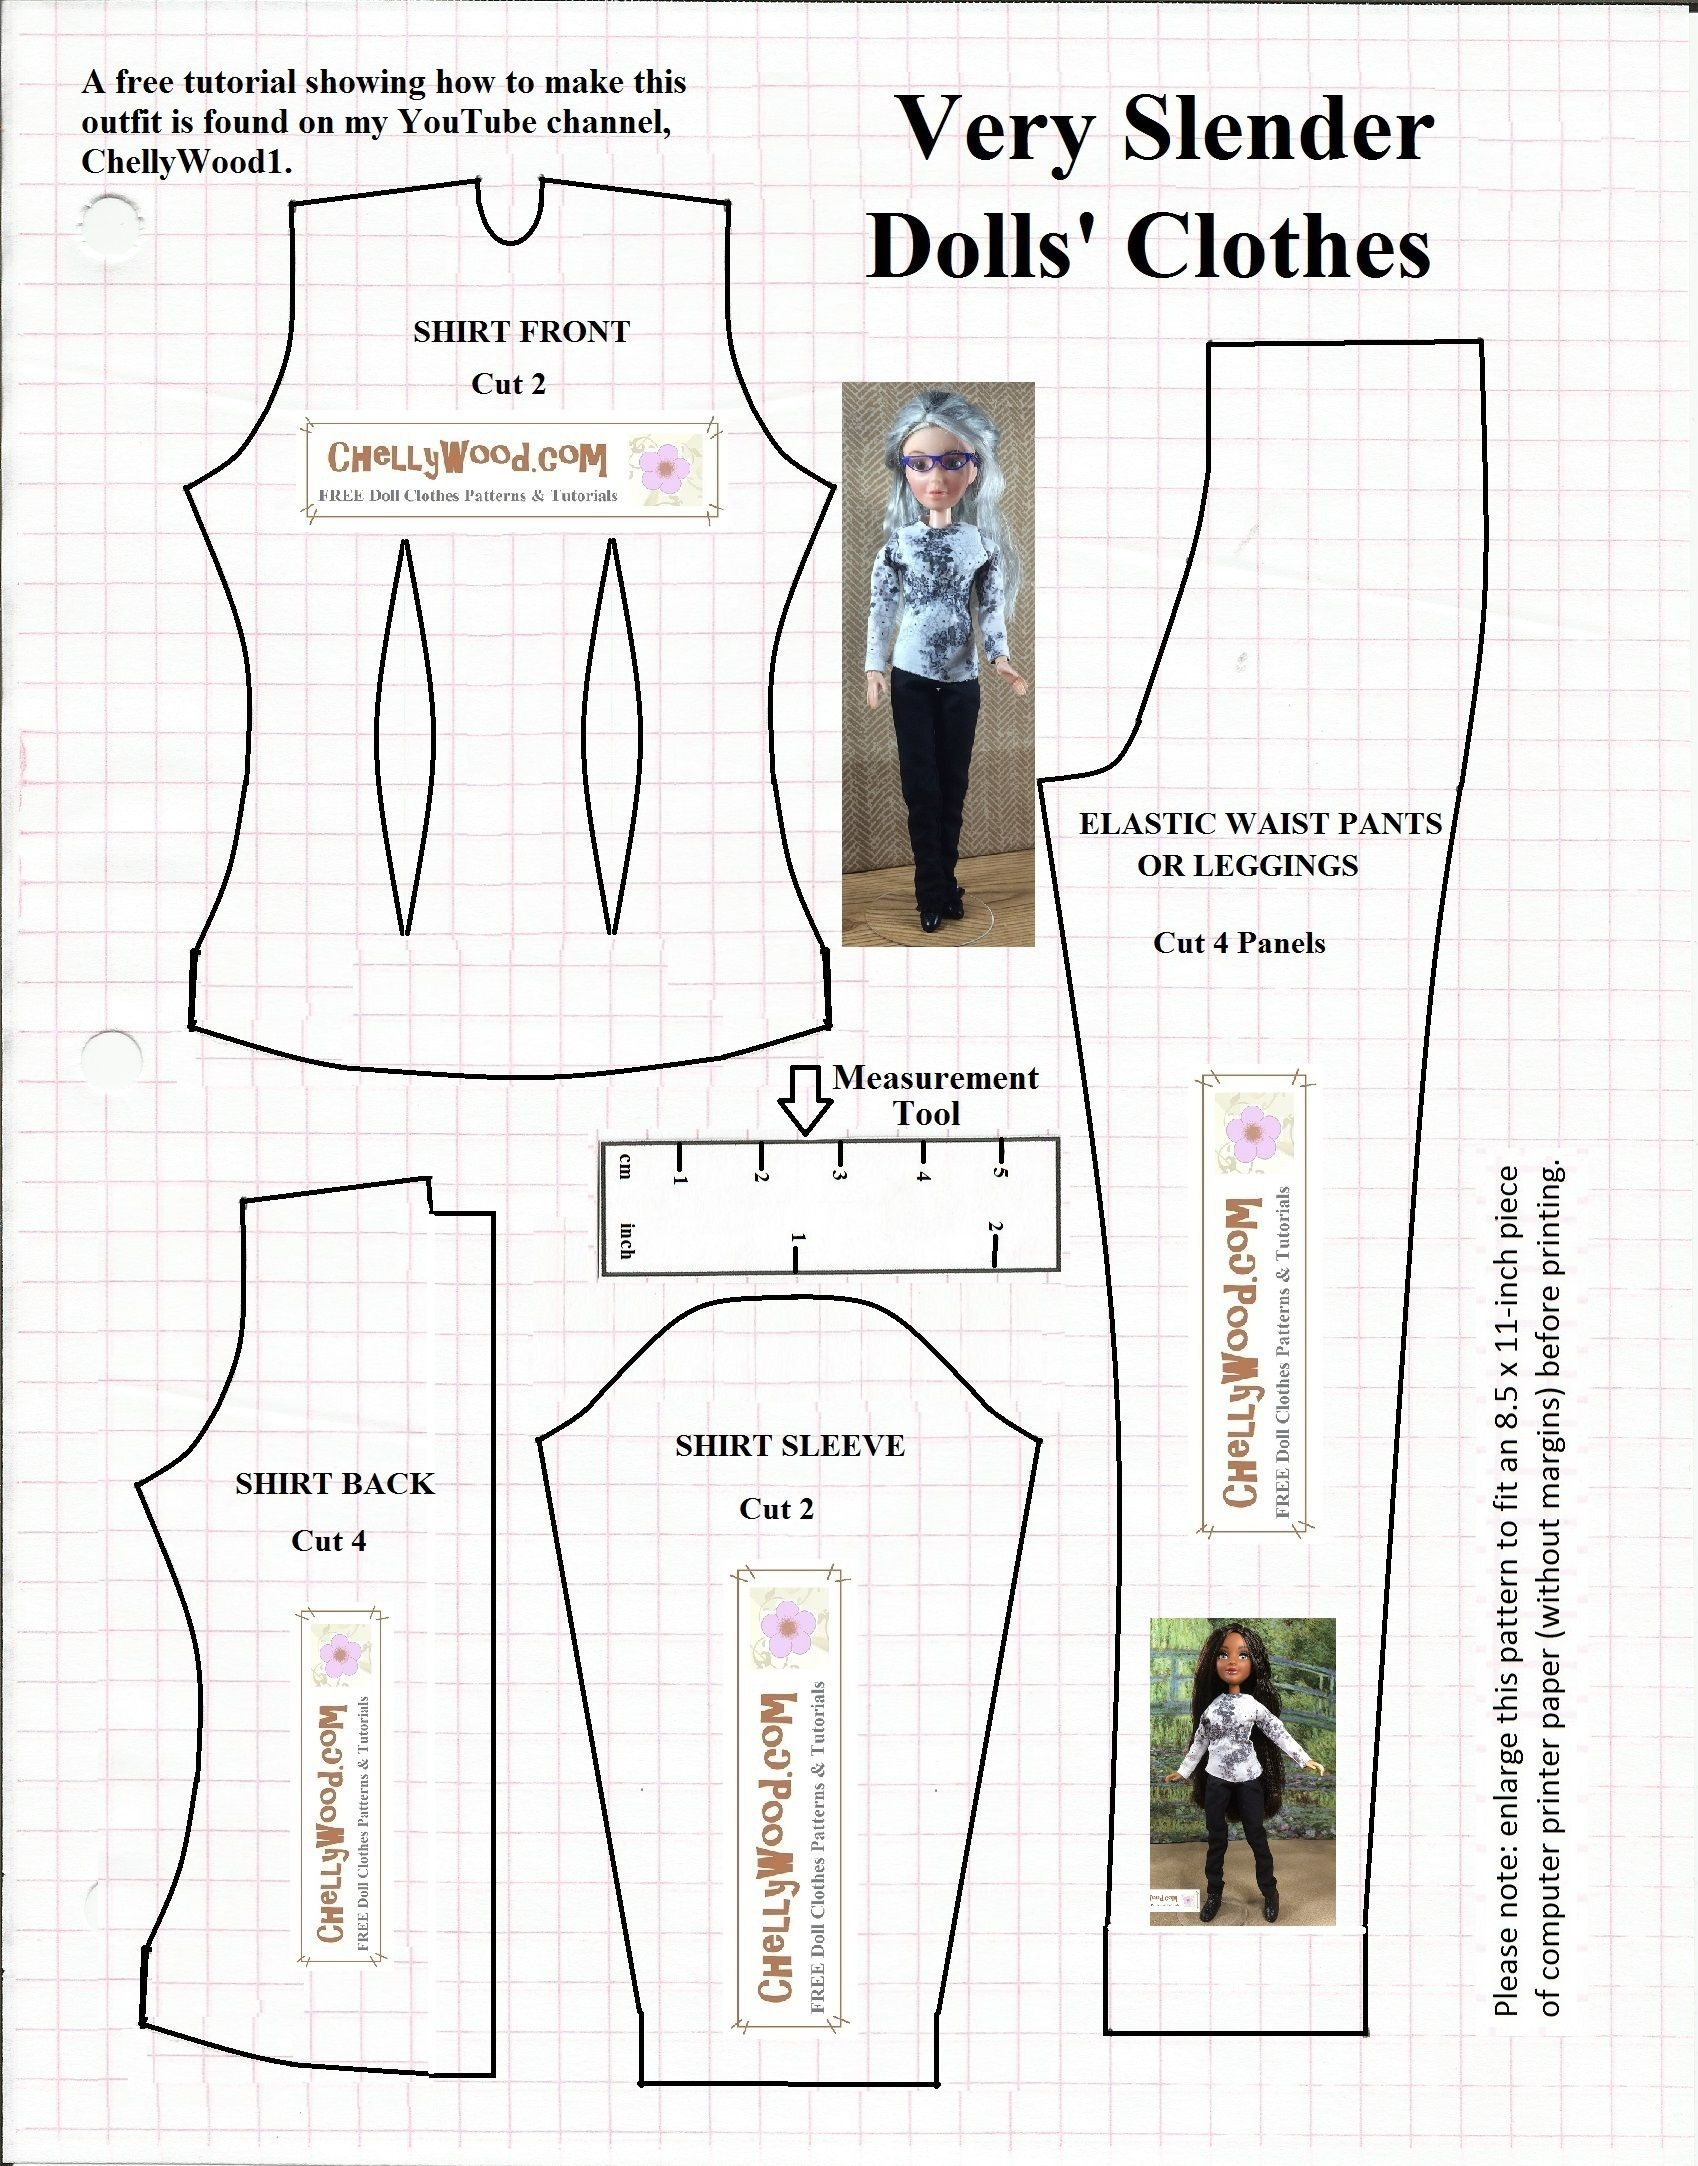 Image Result For Free Printable Ken Doll Clothes Patterns | Barbie - Ken Clothes Patterns Free Printable